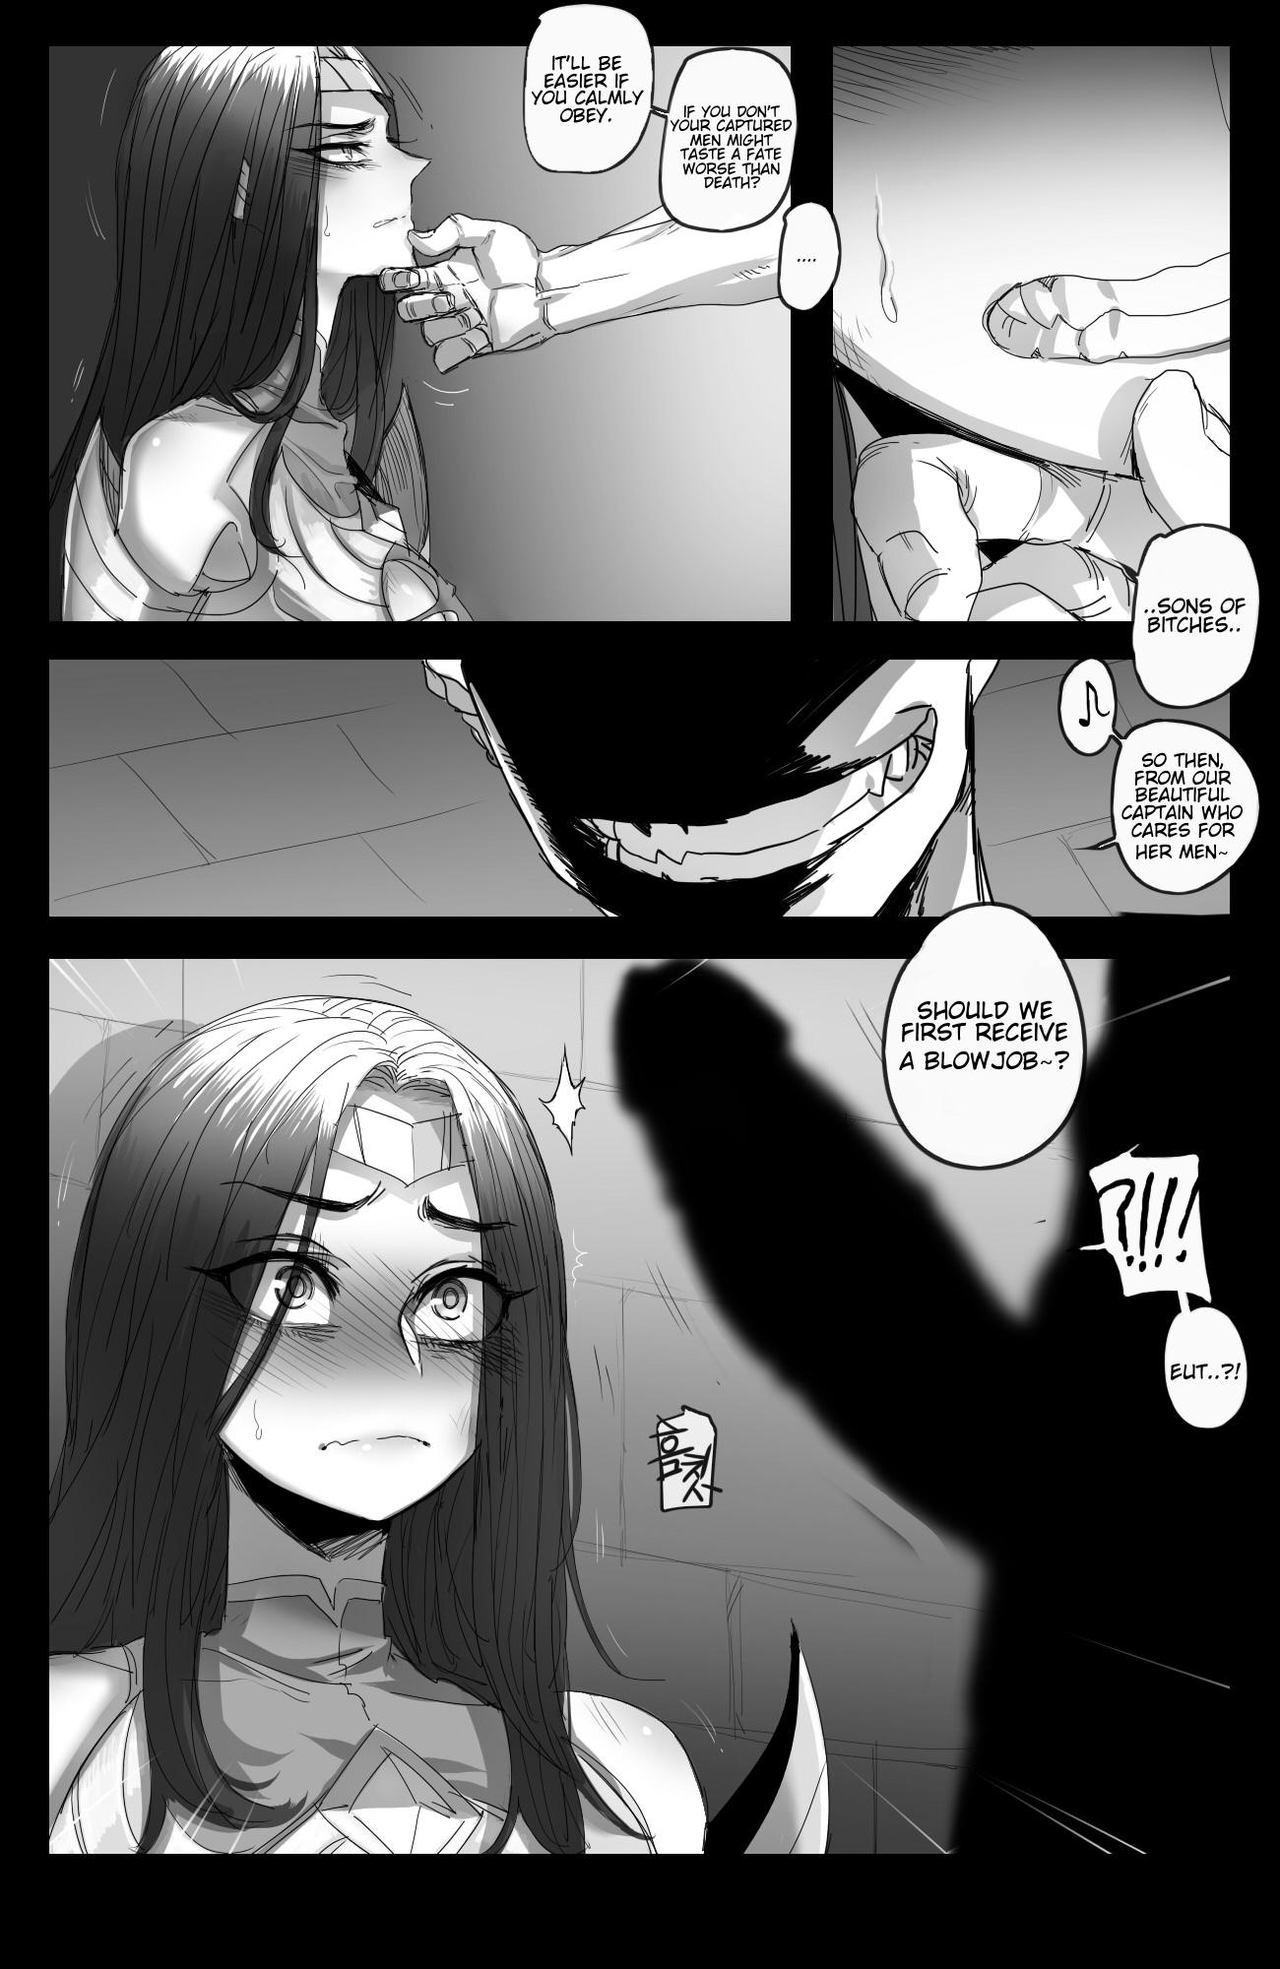 The Fall of Irelia 3